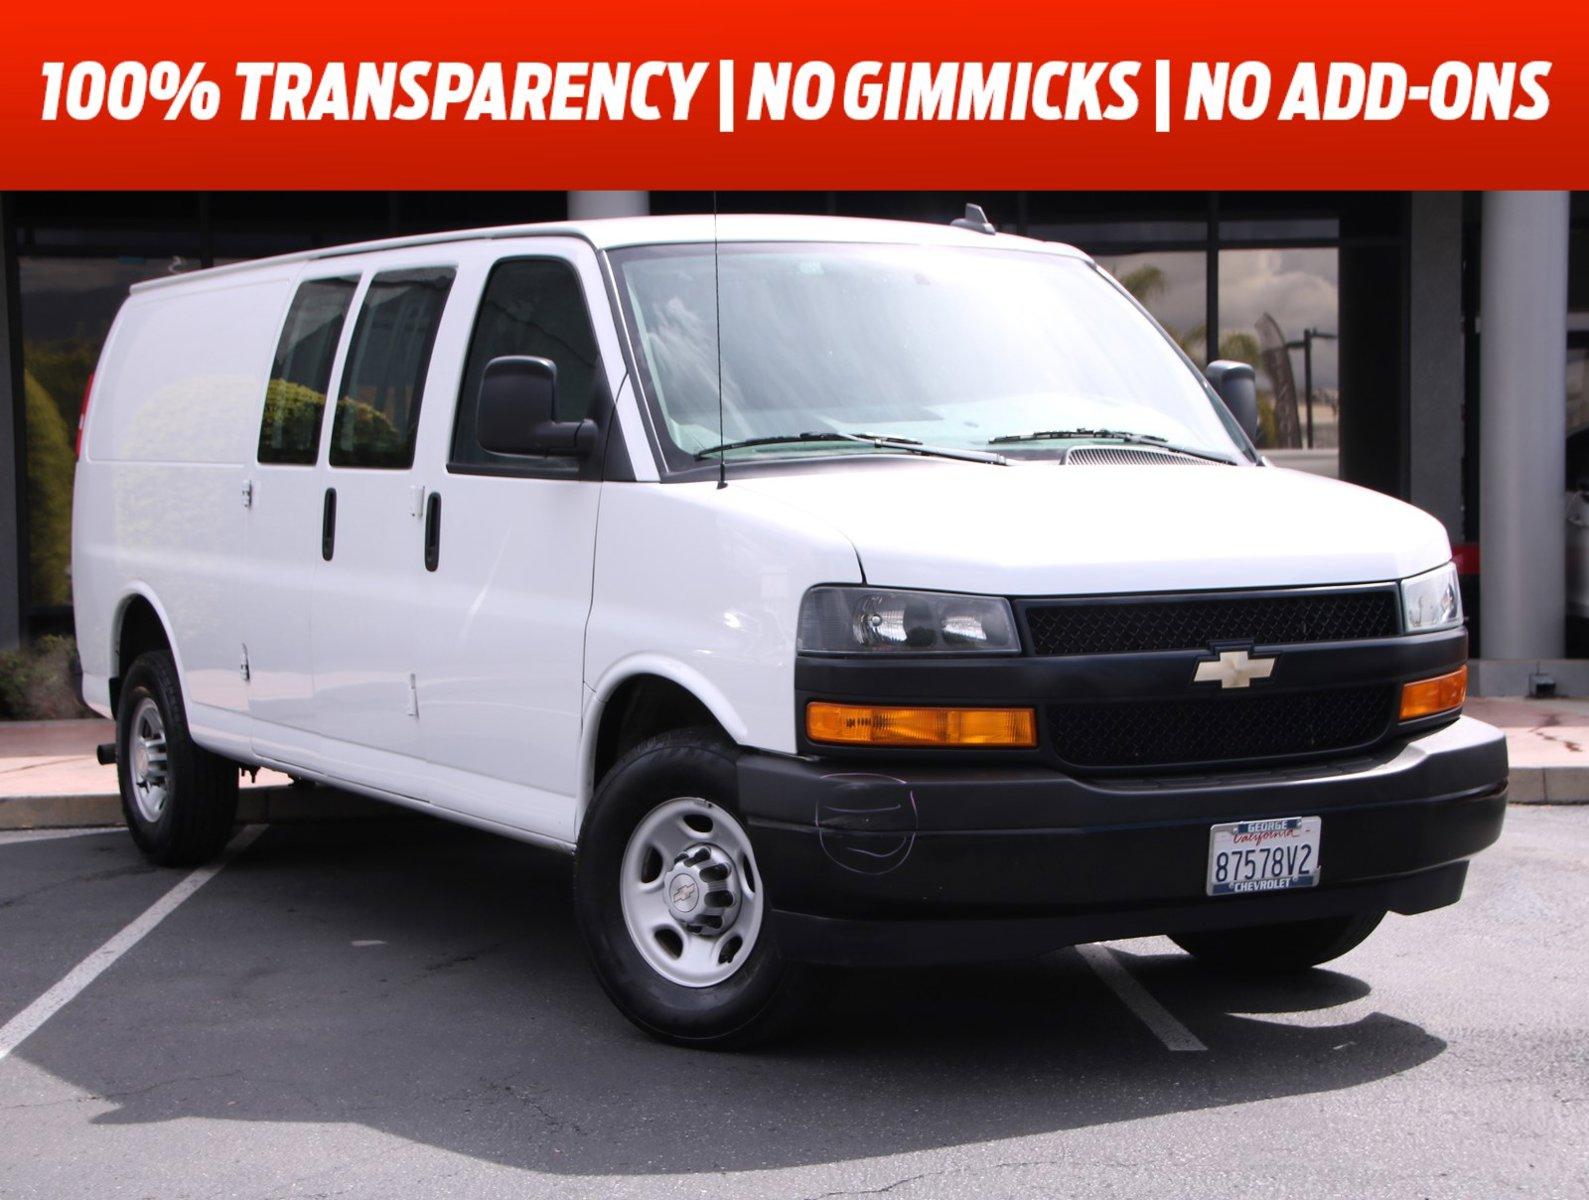 "2020 Chevrolet Express Cargo Van RWD 2500 155"" Gas/Ethanol V8 6.0L/364 [5]"